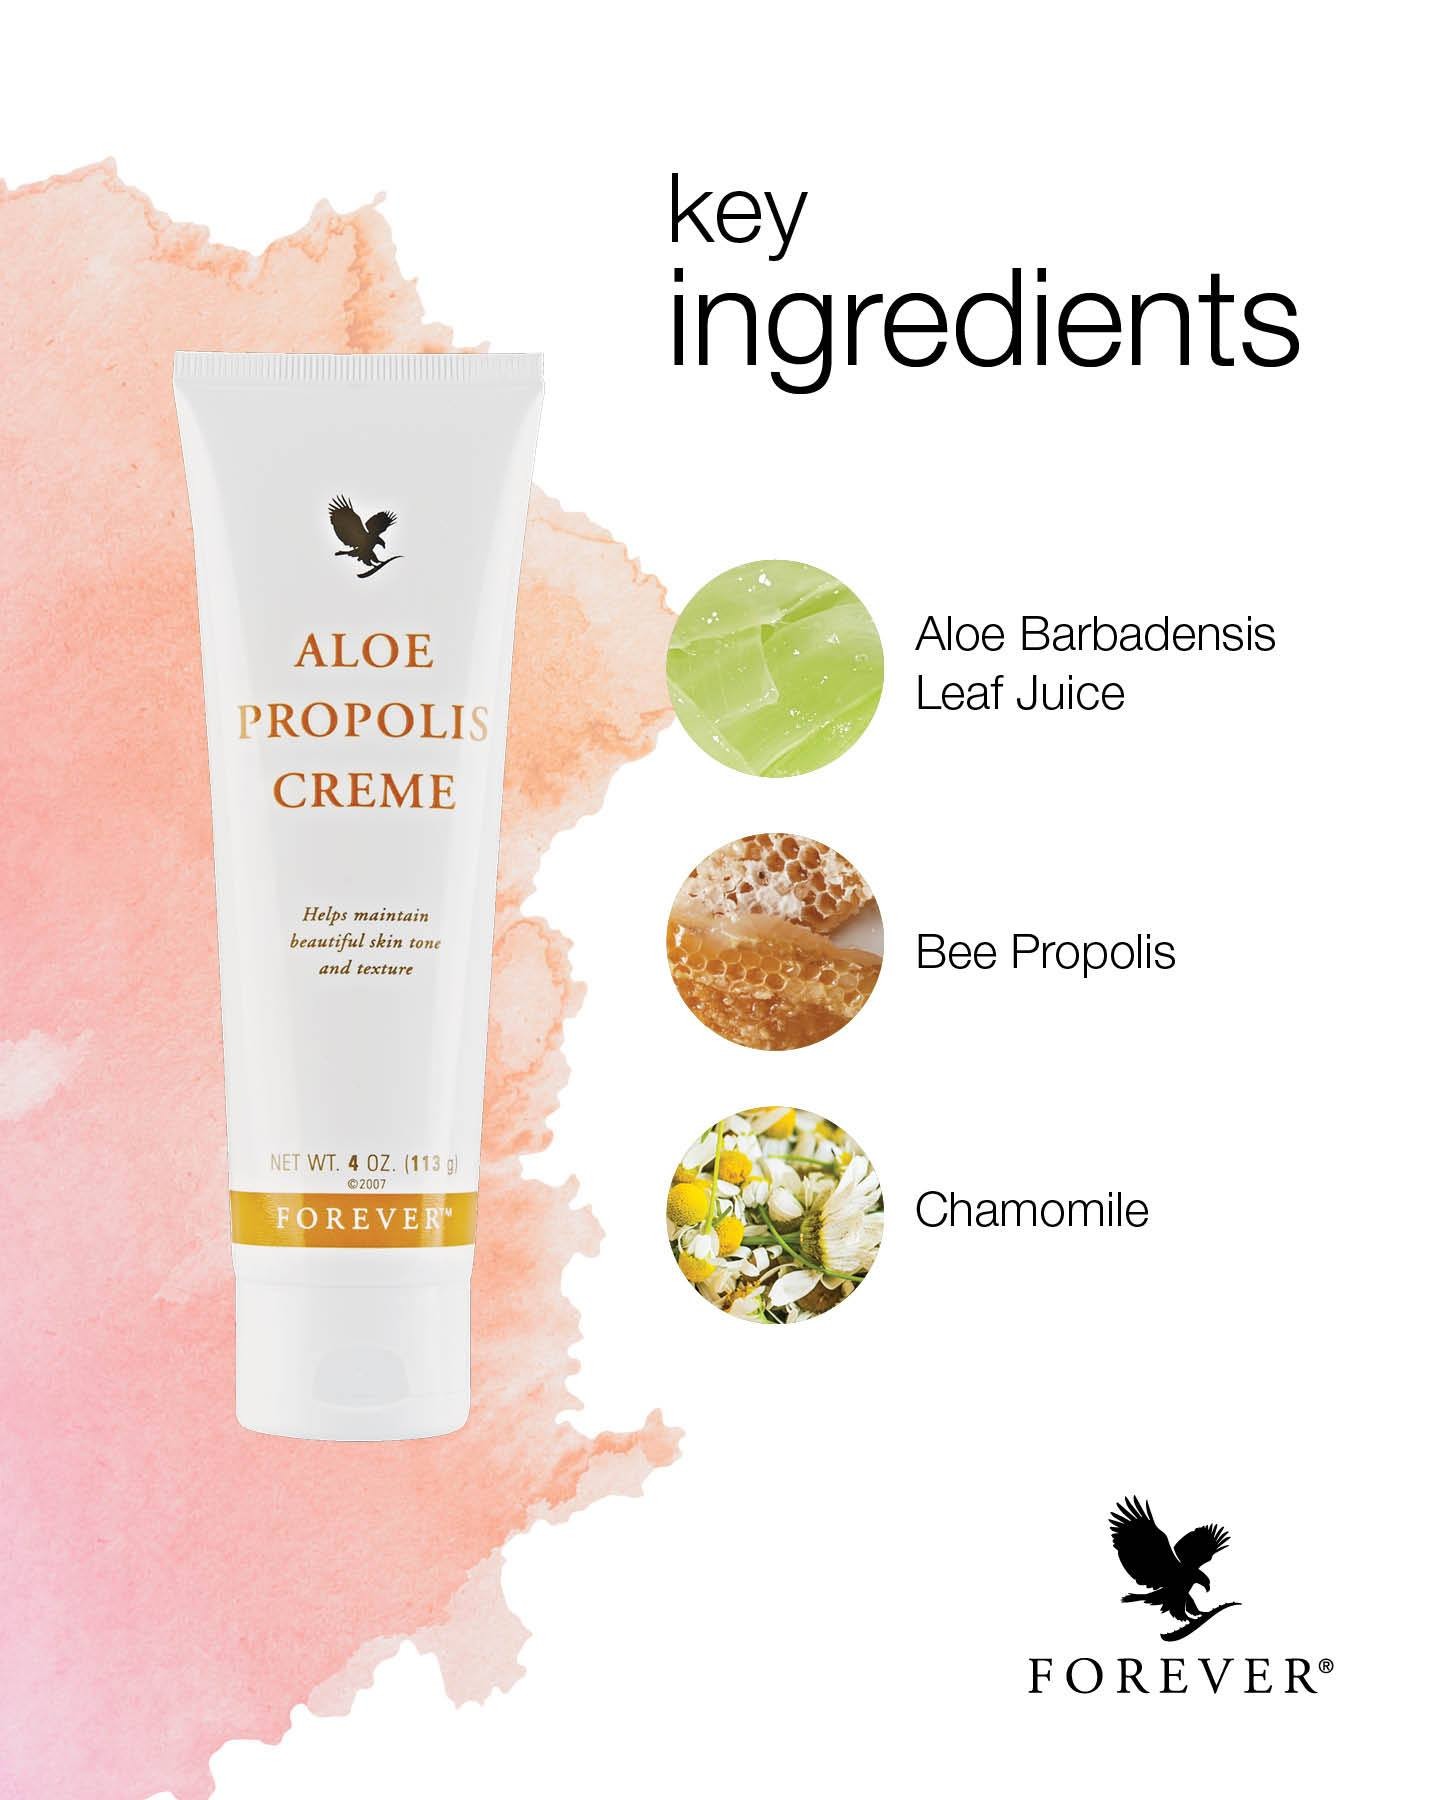 Aloe Propolis Creme Ingredients